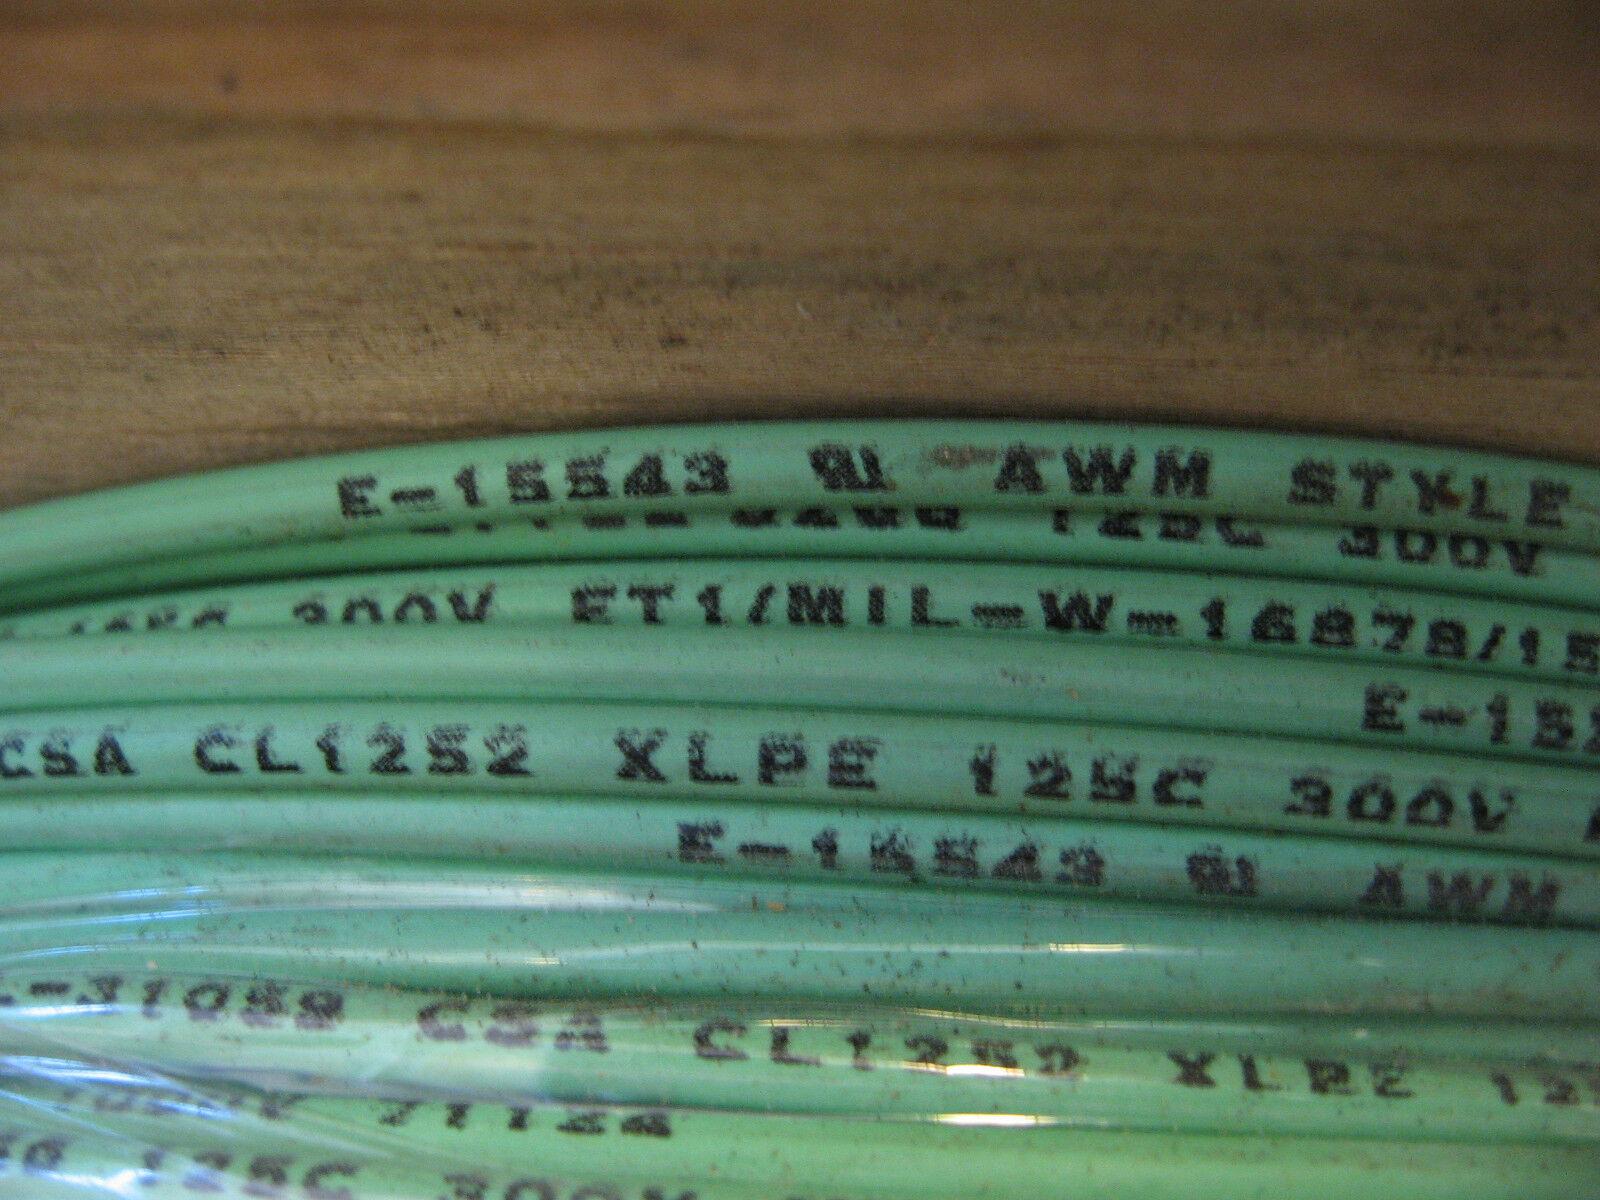 Cable de conexión 3266, 14 AWG AWM 125 pies) C 300 V VW-1/LL-31059 (2000 pies) 125 MIL-16878/15 8a7618